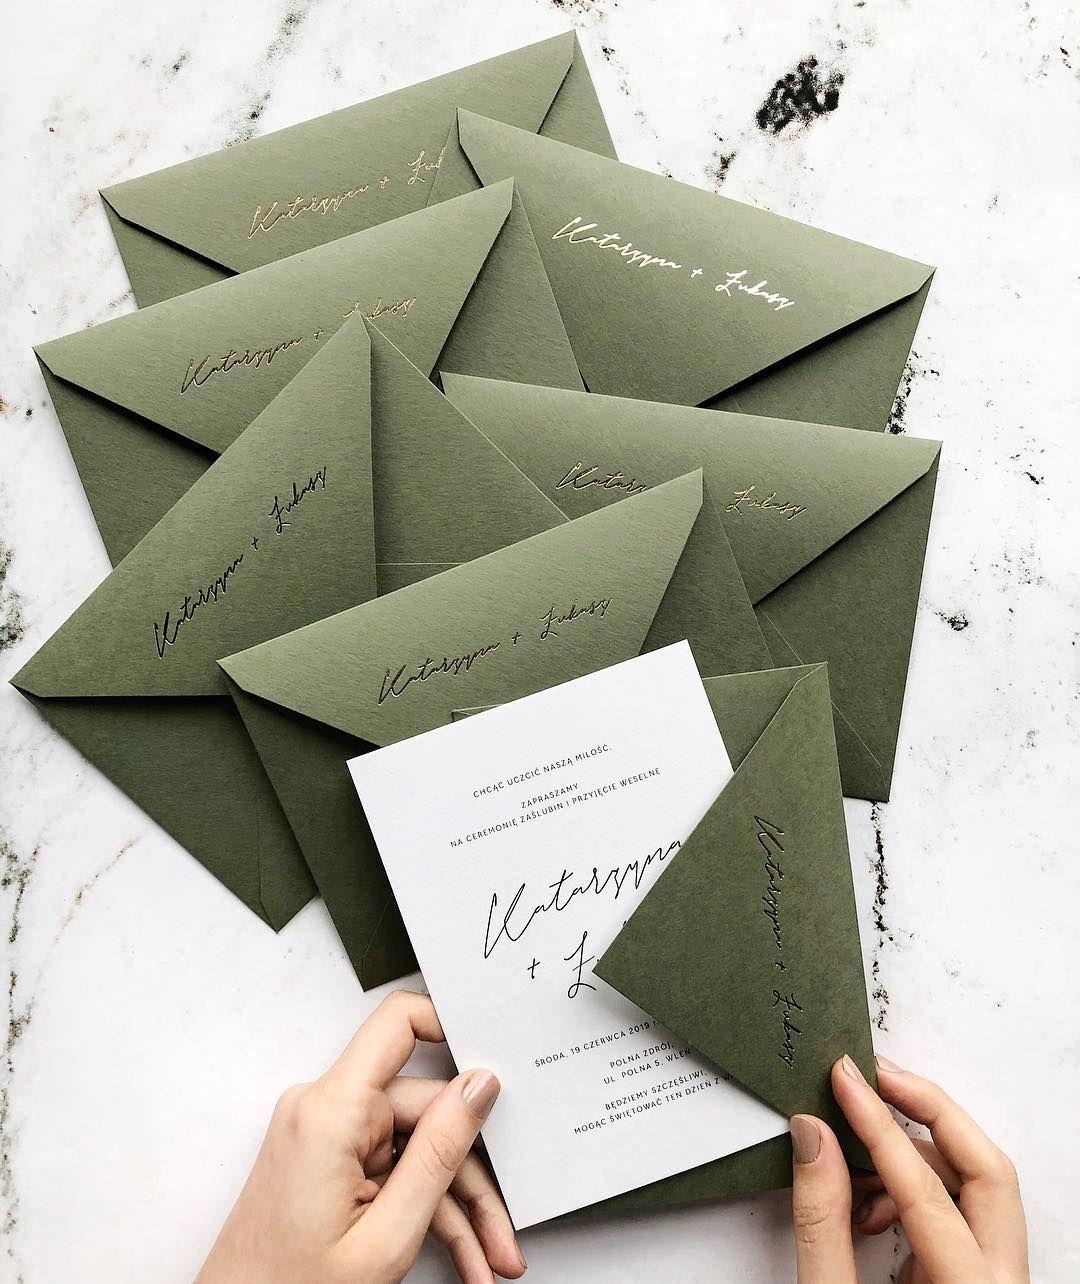 Minimalist Greenery Wedding Invitations With Gold Foil Envelopes Fun Wedding Invitations Green Wedding Invitations Greenery Wedding Invitations